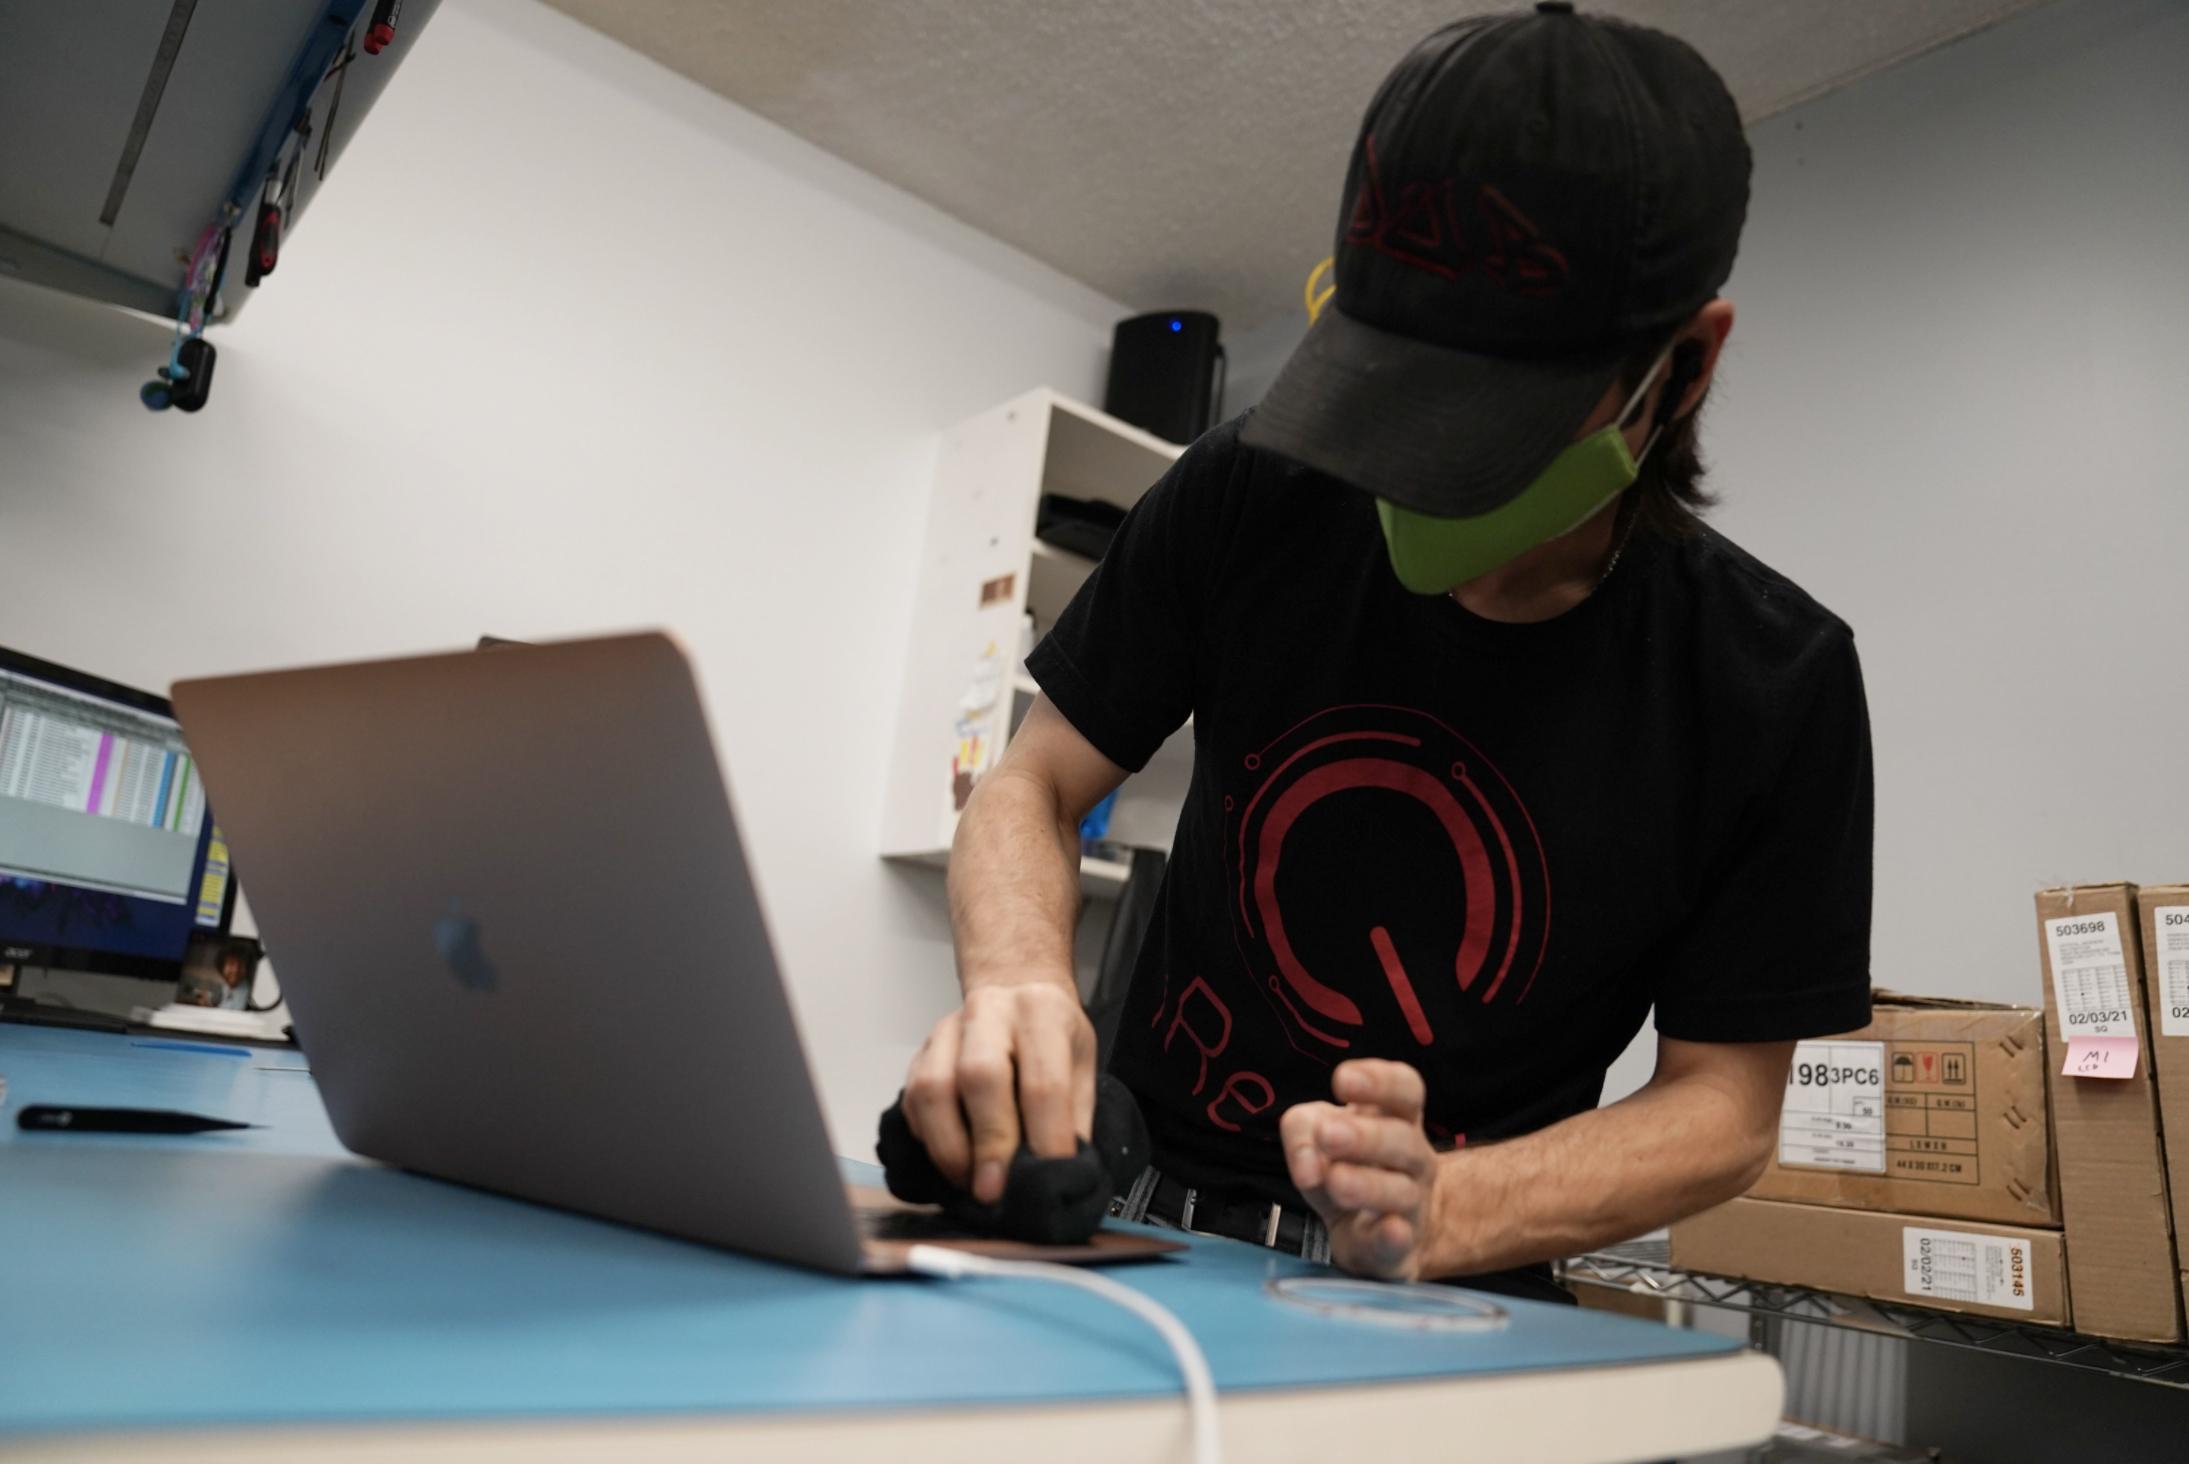 iresQ employee working on laptop